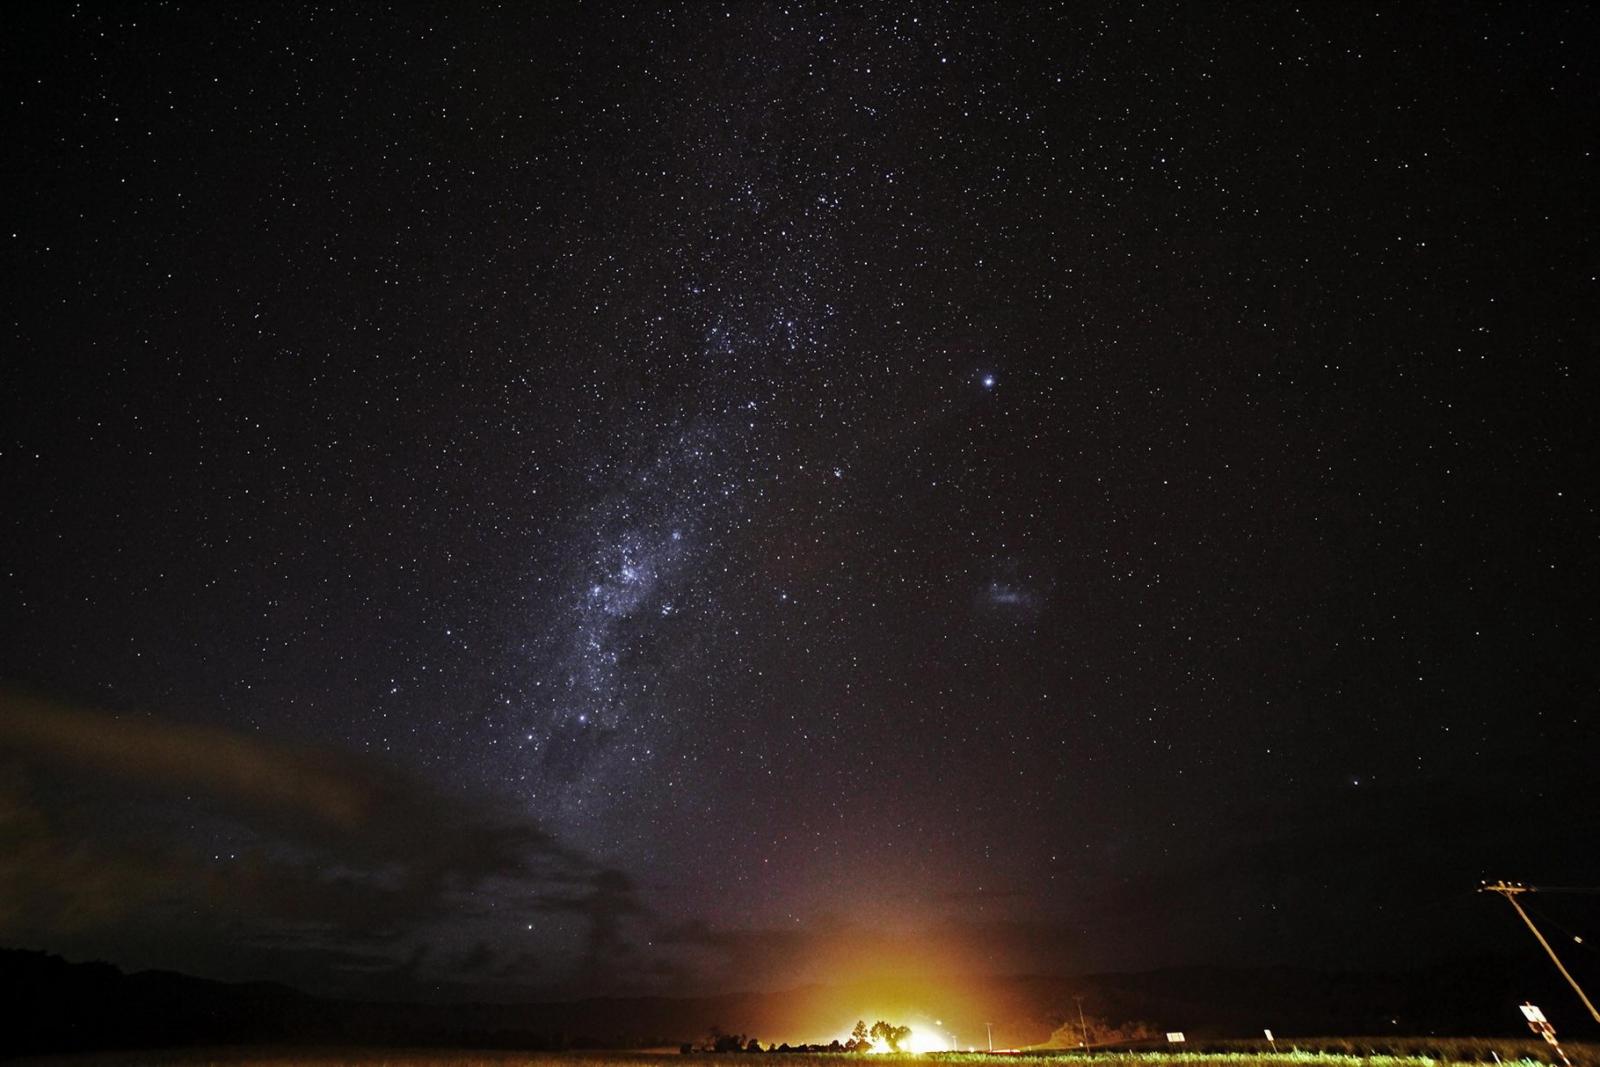 astro11.jpg